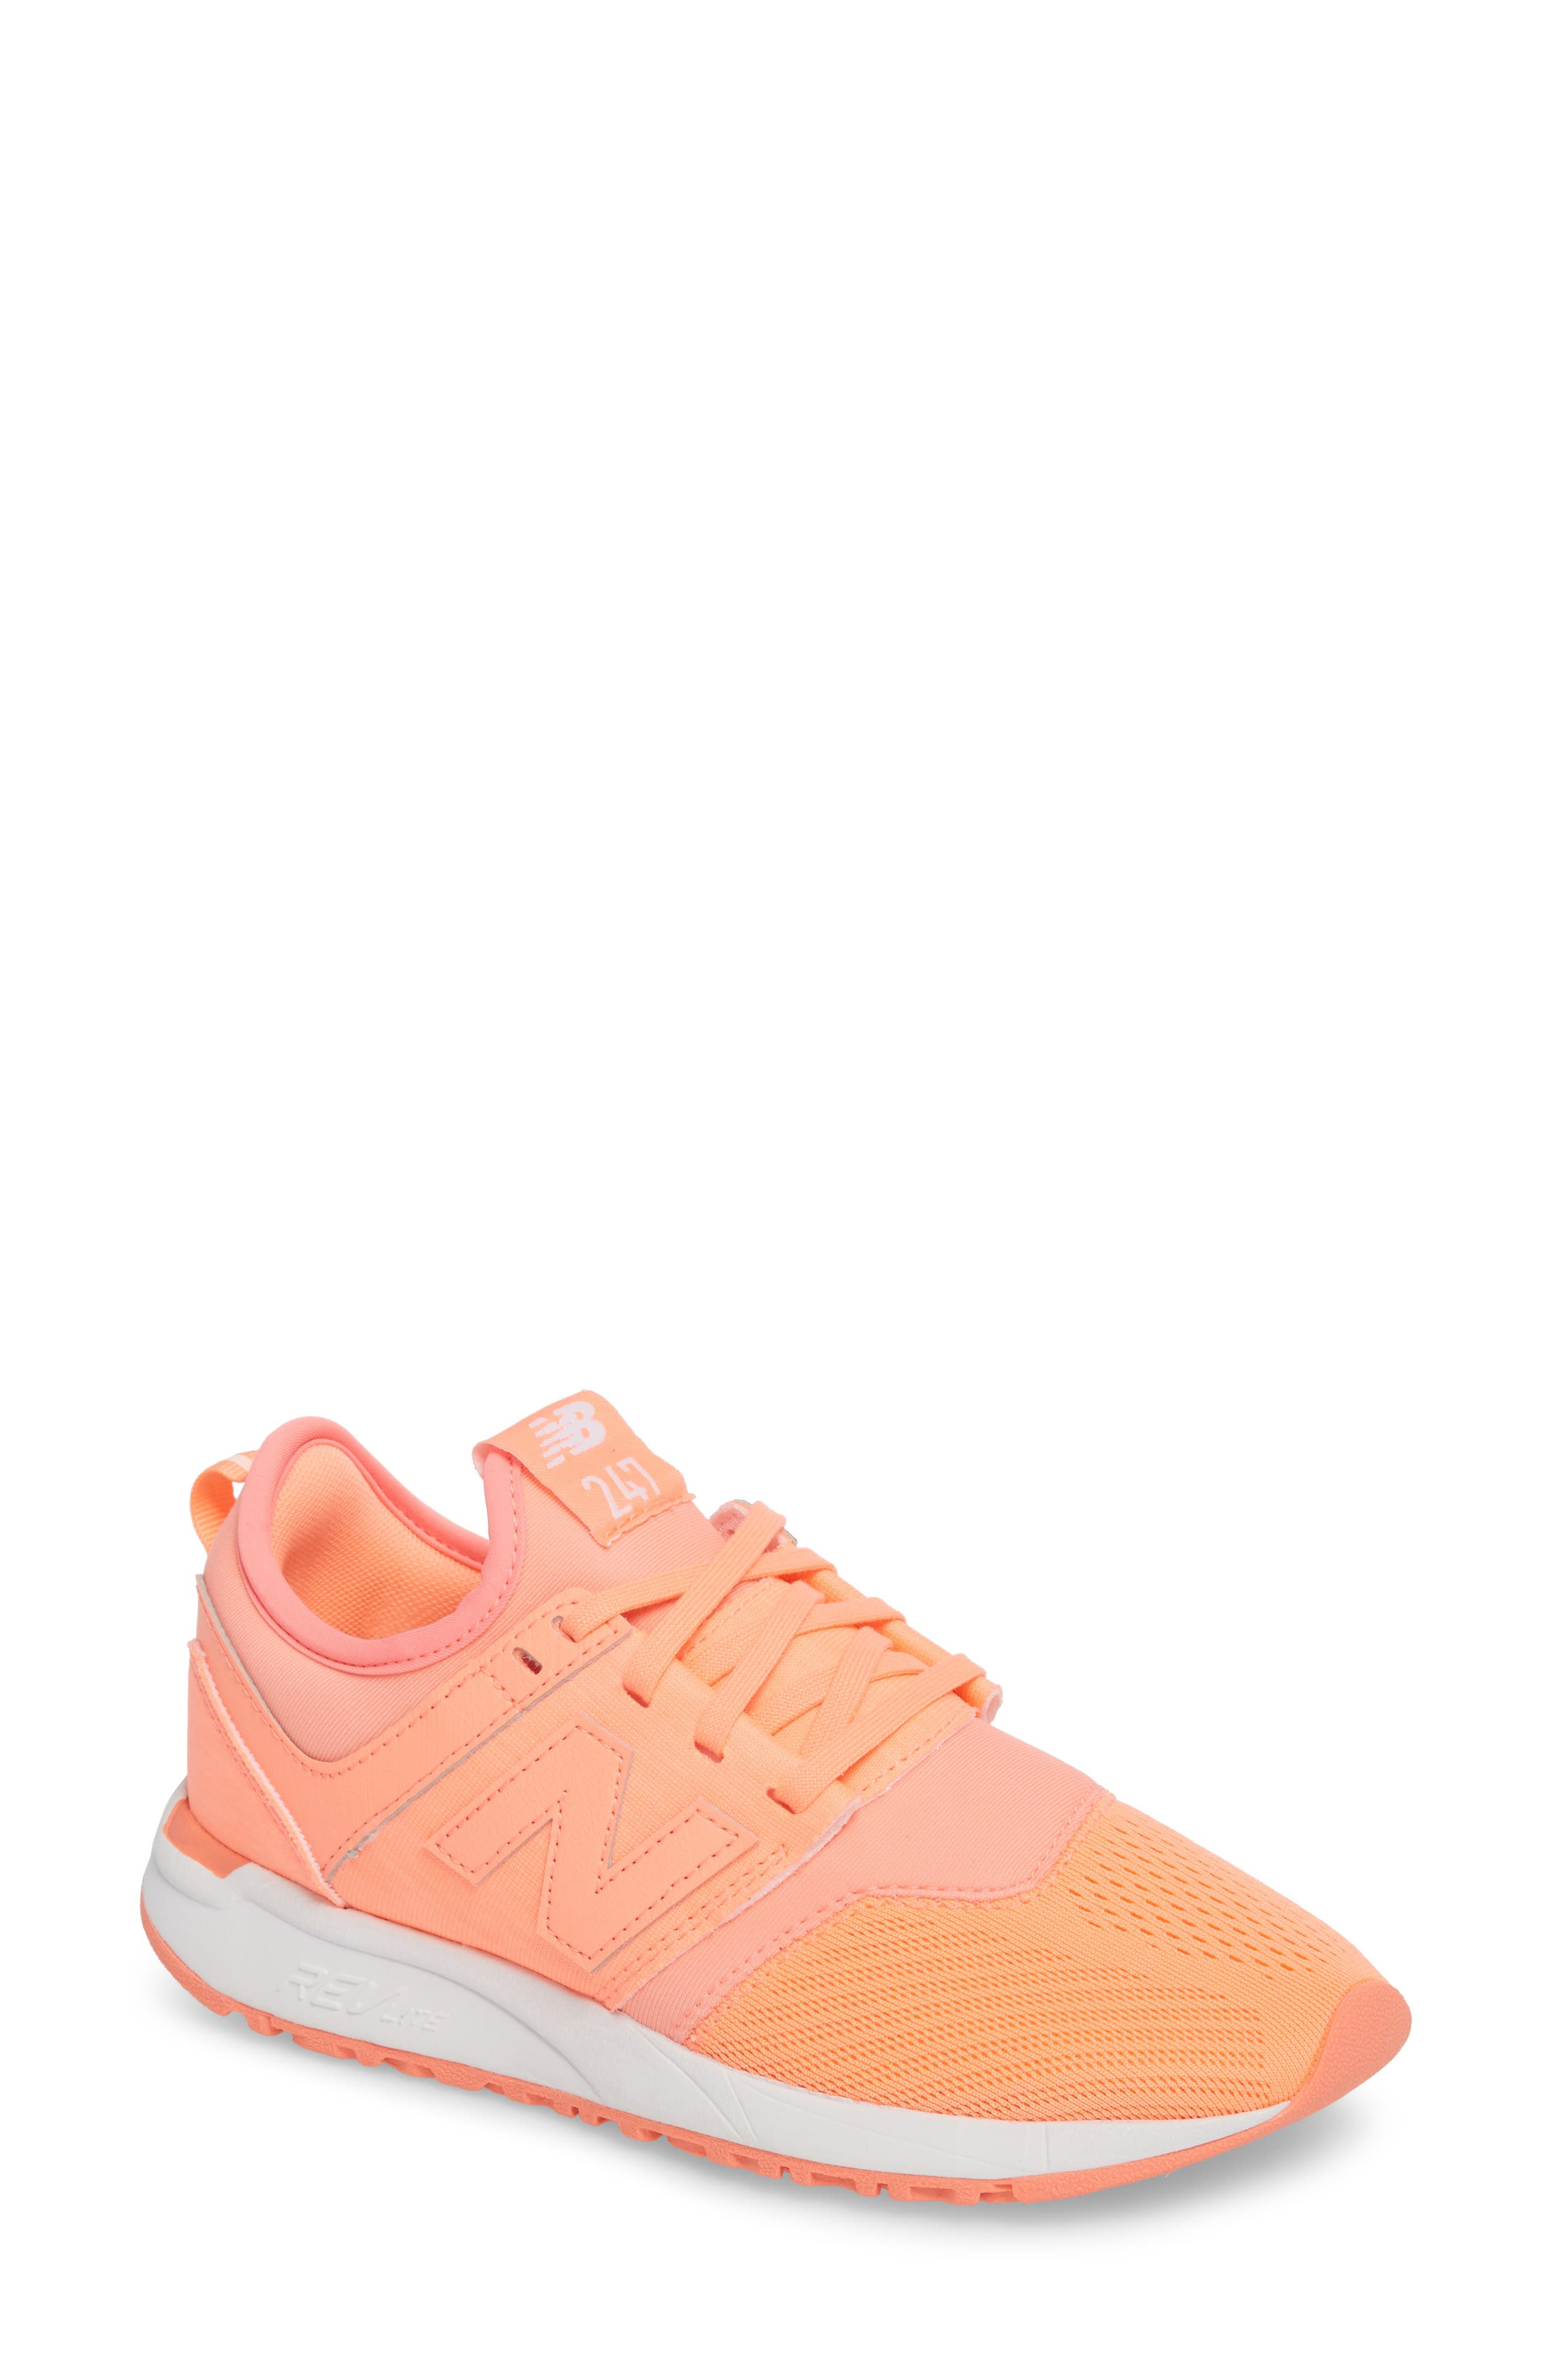 247 Classic Sneaker,                             Main thumbnail 1, color,                             Fiji